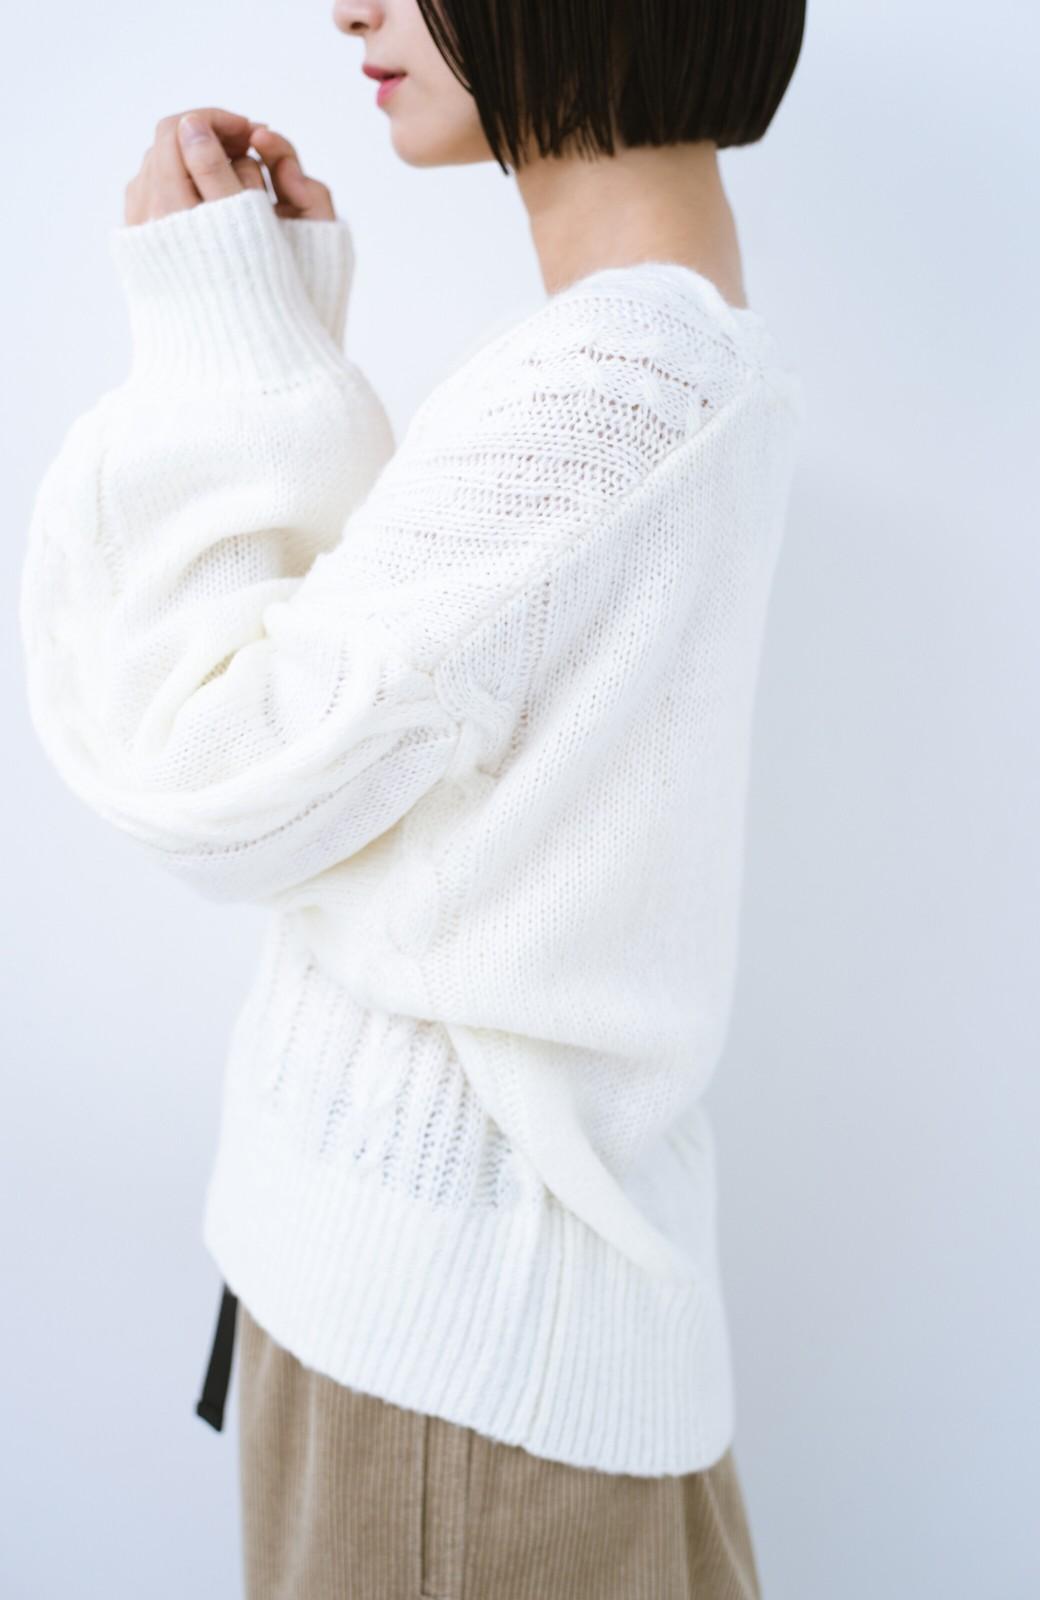 haco!  むくみを気にせず女っぽく仕上げてくれる軽量ケーブルニットトップス【まったり期~もやもや期】女の子バンザイ!プロジェクト <オフホワイト>の商品写真6